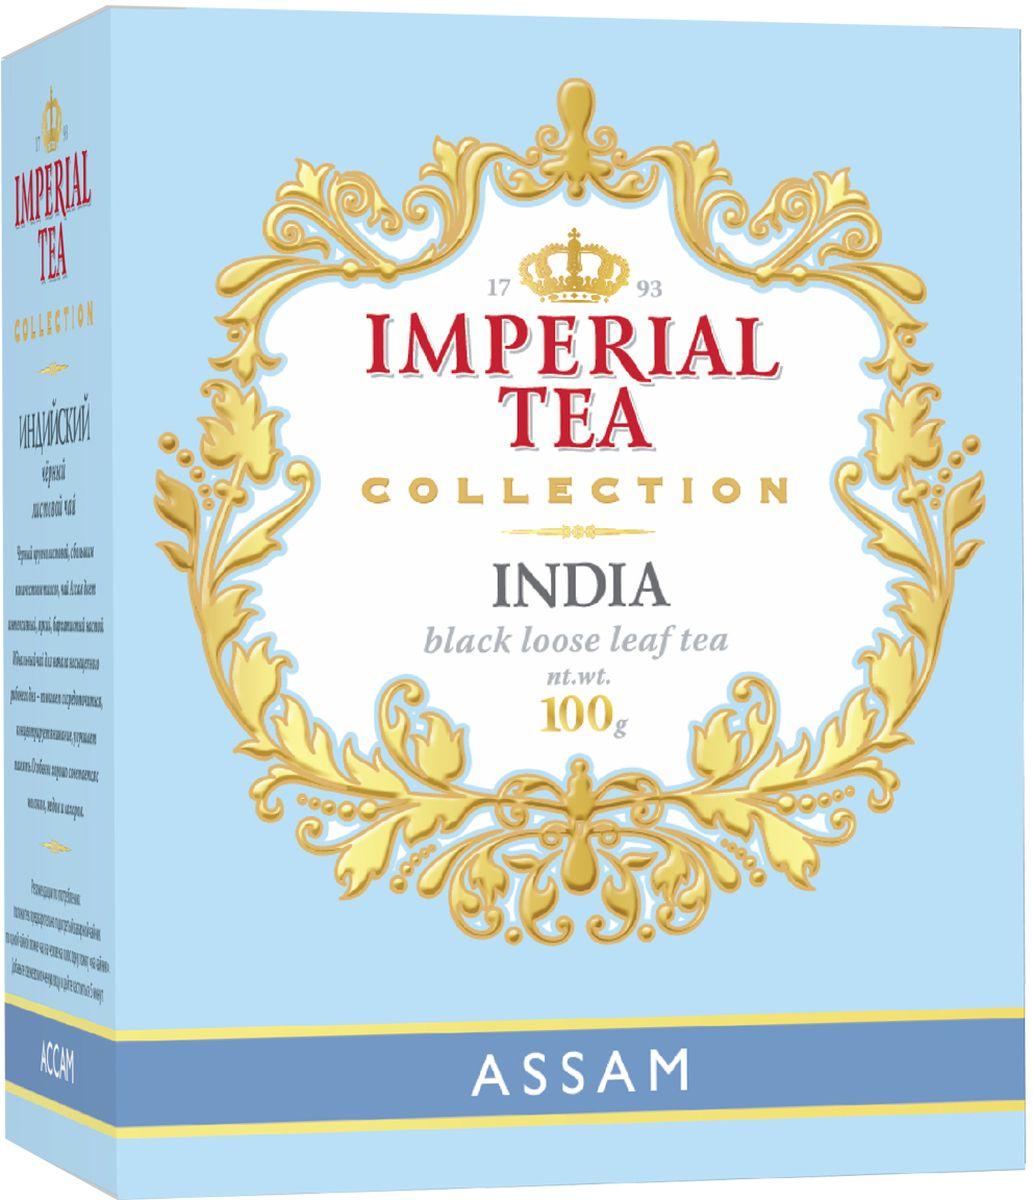 Императорский чай Collection Ассам, 100 г 2005 чай ассам хармутти оптом